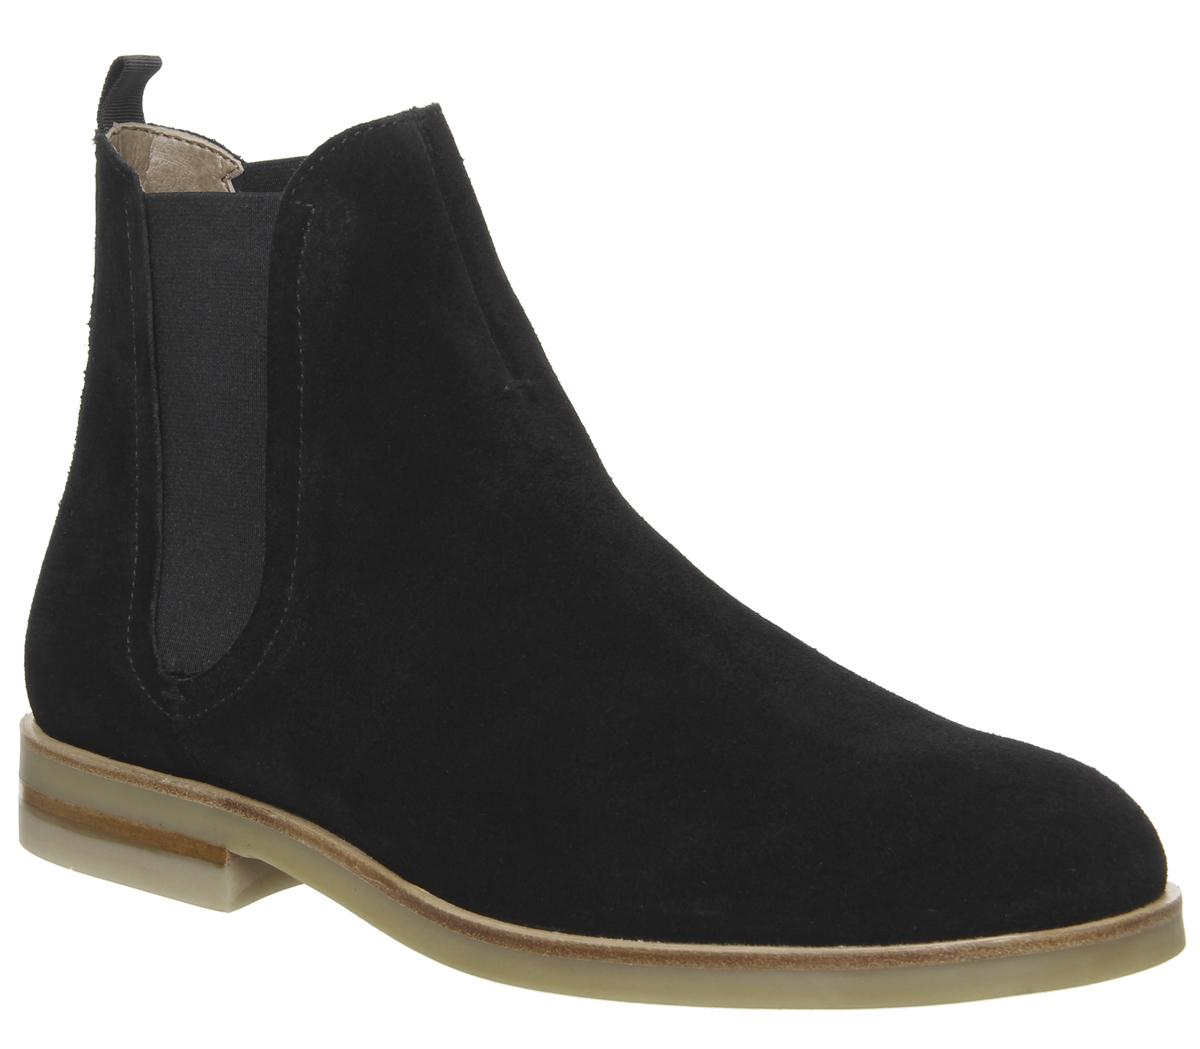 Adlington Chelsea Boots